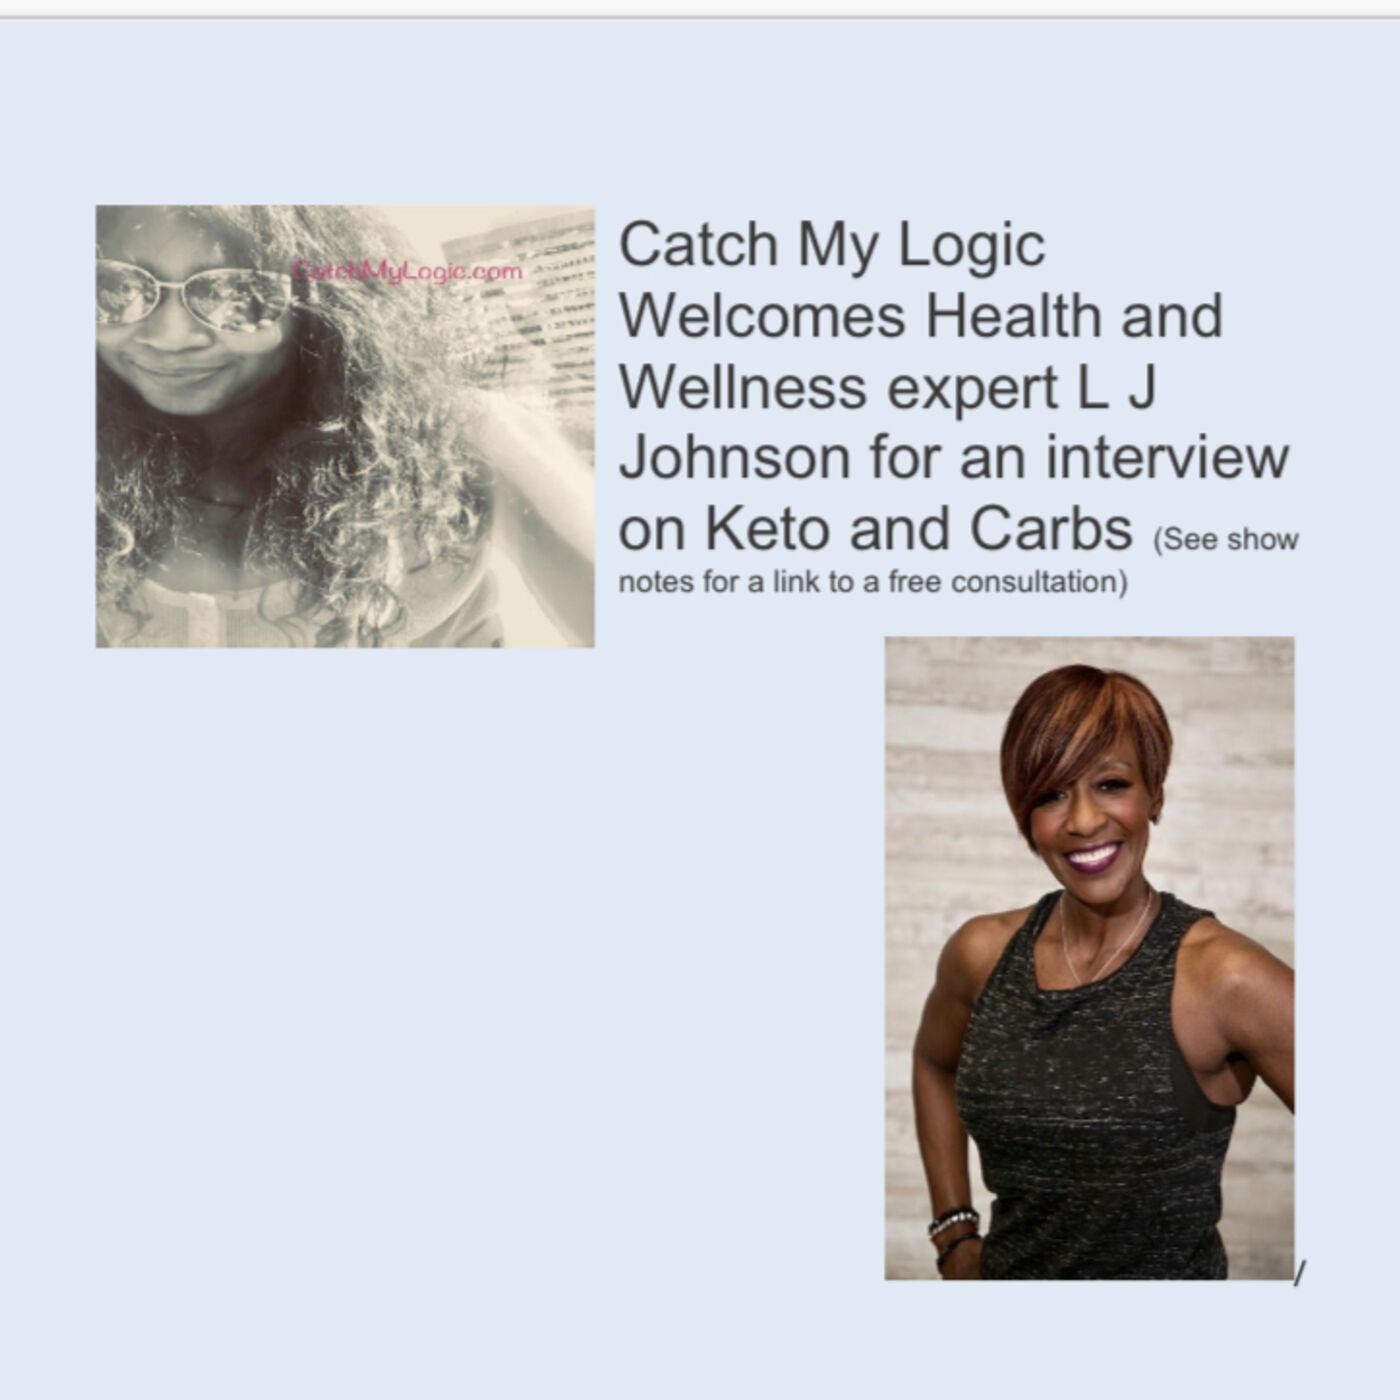 Interview with Keto Coach L J Johnson